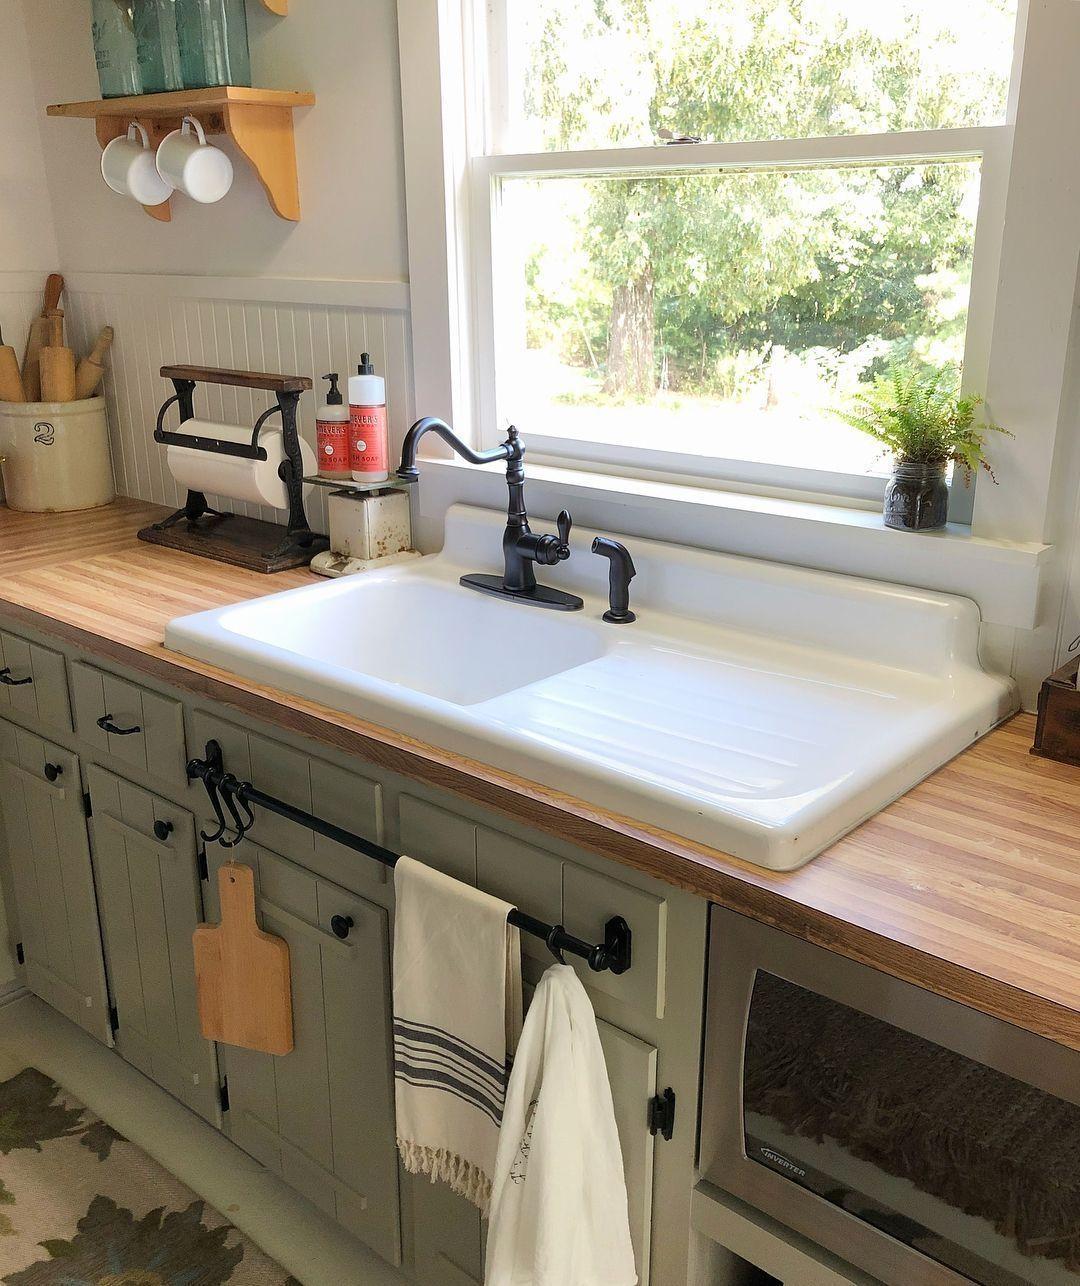 35 Awesome Sink You Can Put In Your Kitchen Jeder Von Uns Hat Unterschiedliche 35 Awesome In 2020 Farmhouse Sink Kitchen Farmhouse Sink Faucet Best Kitchen Sinks